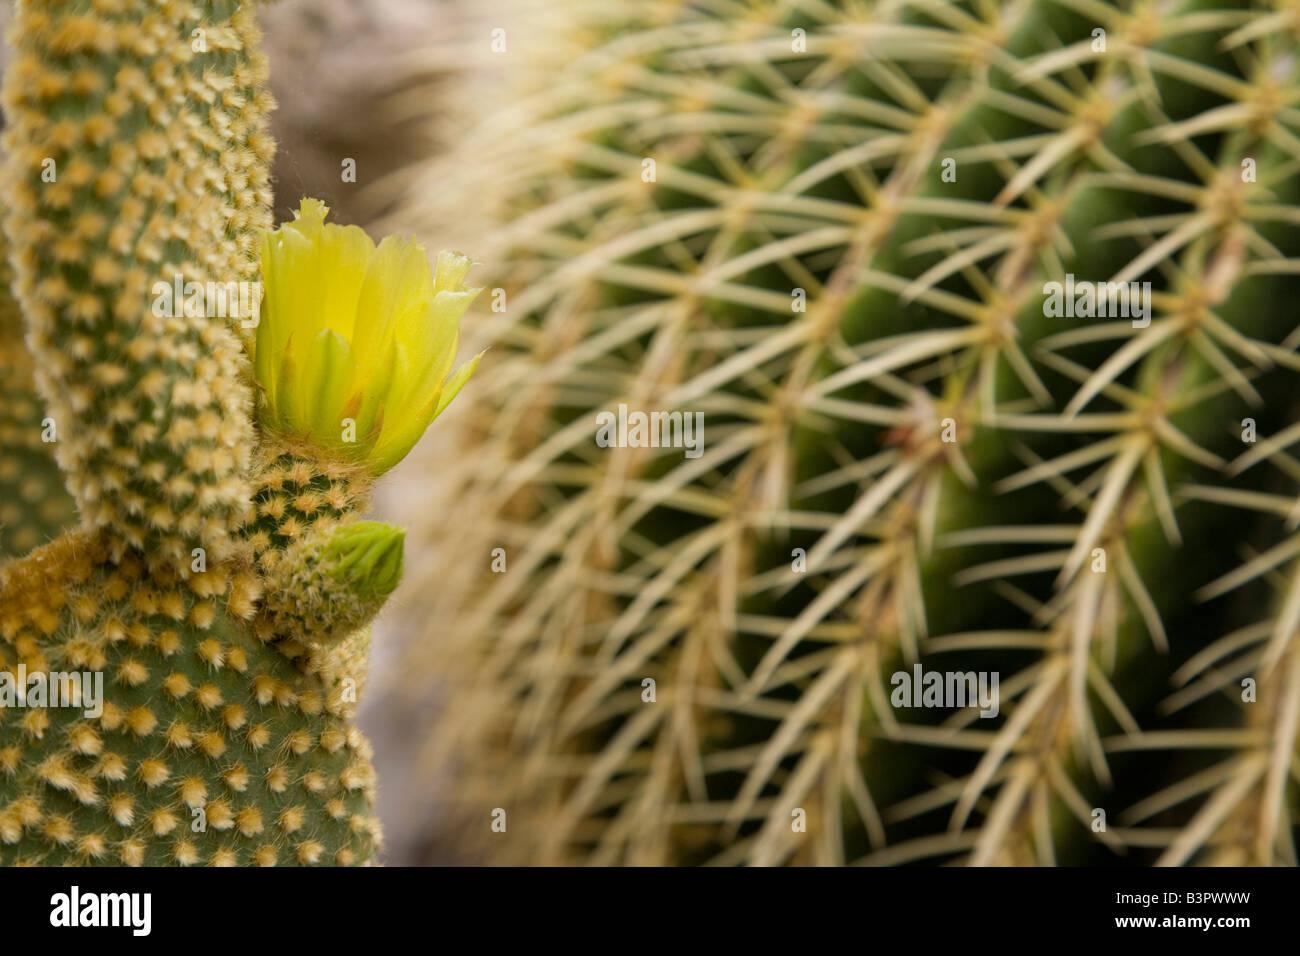 Monaco, Cote d'Azur, Flowering cactus, close up - Stock Image